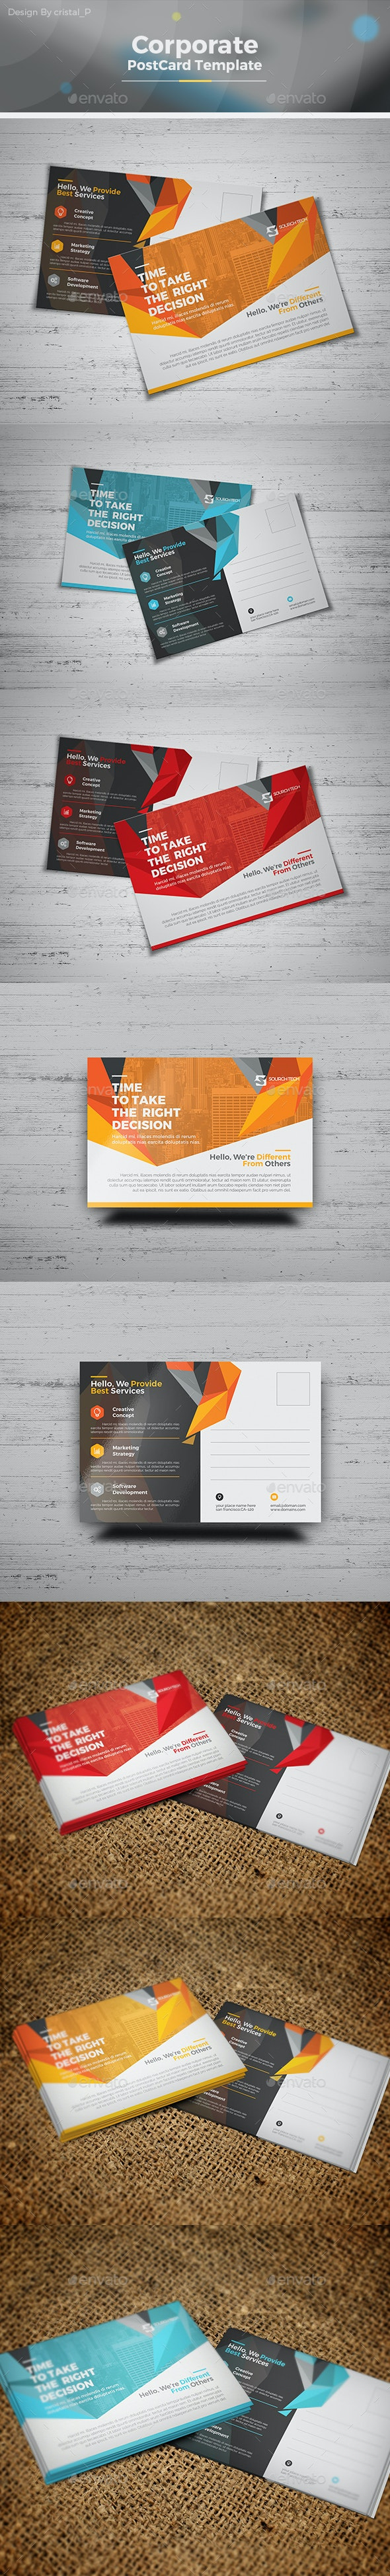 Corporate Business Postcard - Cards & Invites Print Templates